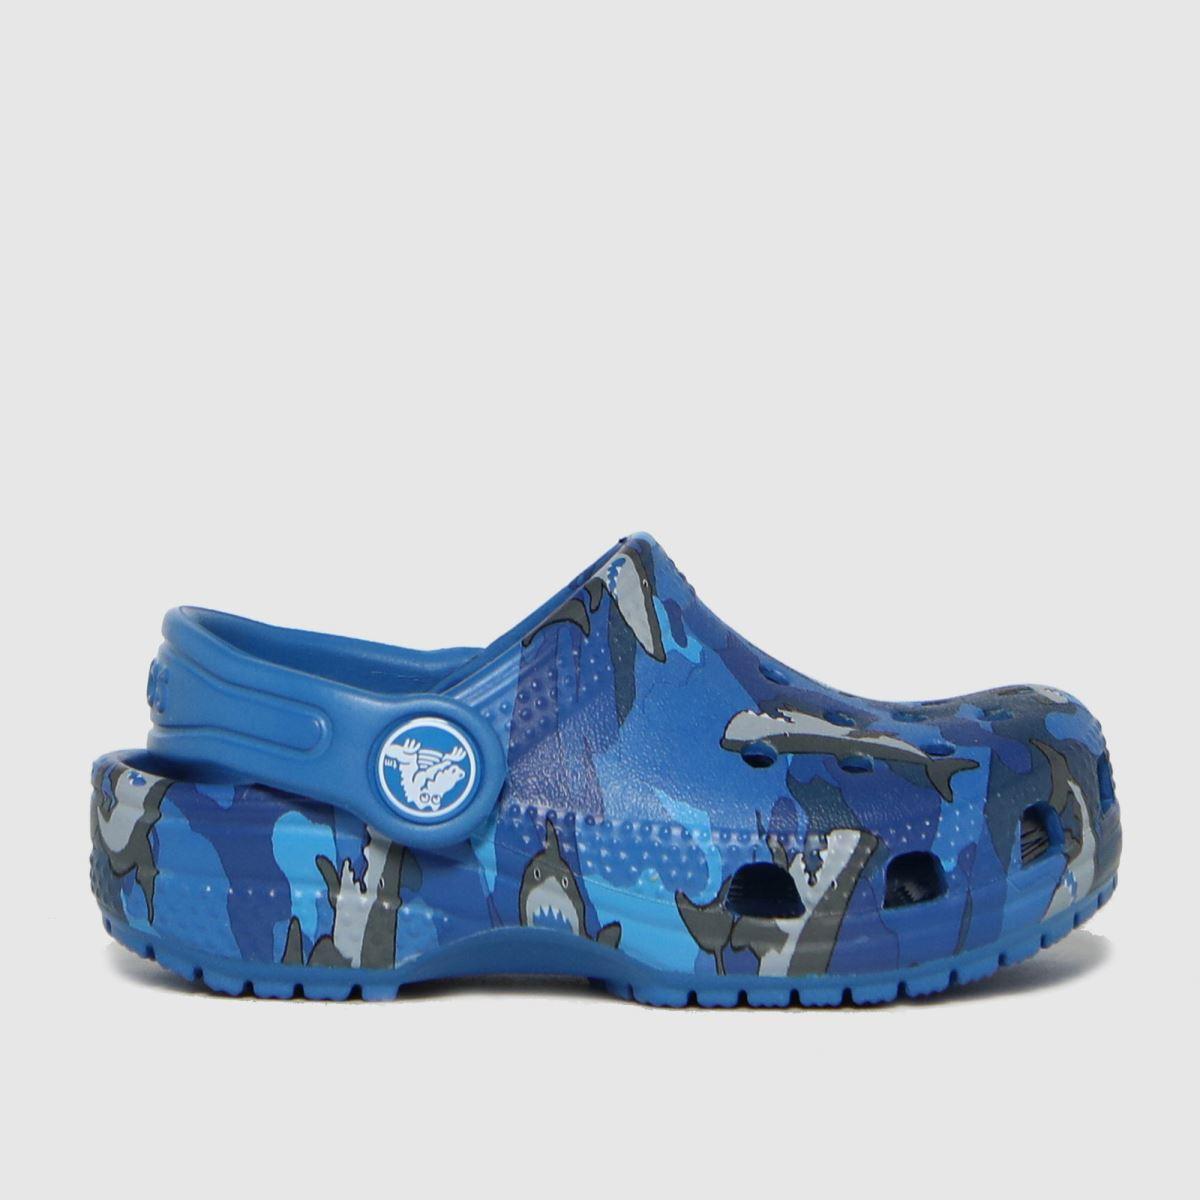 Crocs Blue Classic Clog SANDAL Toddler